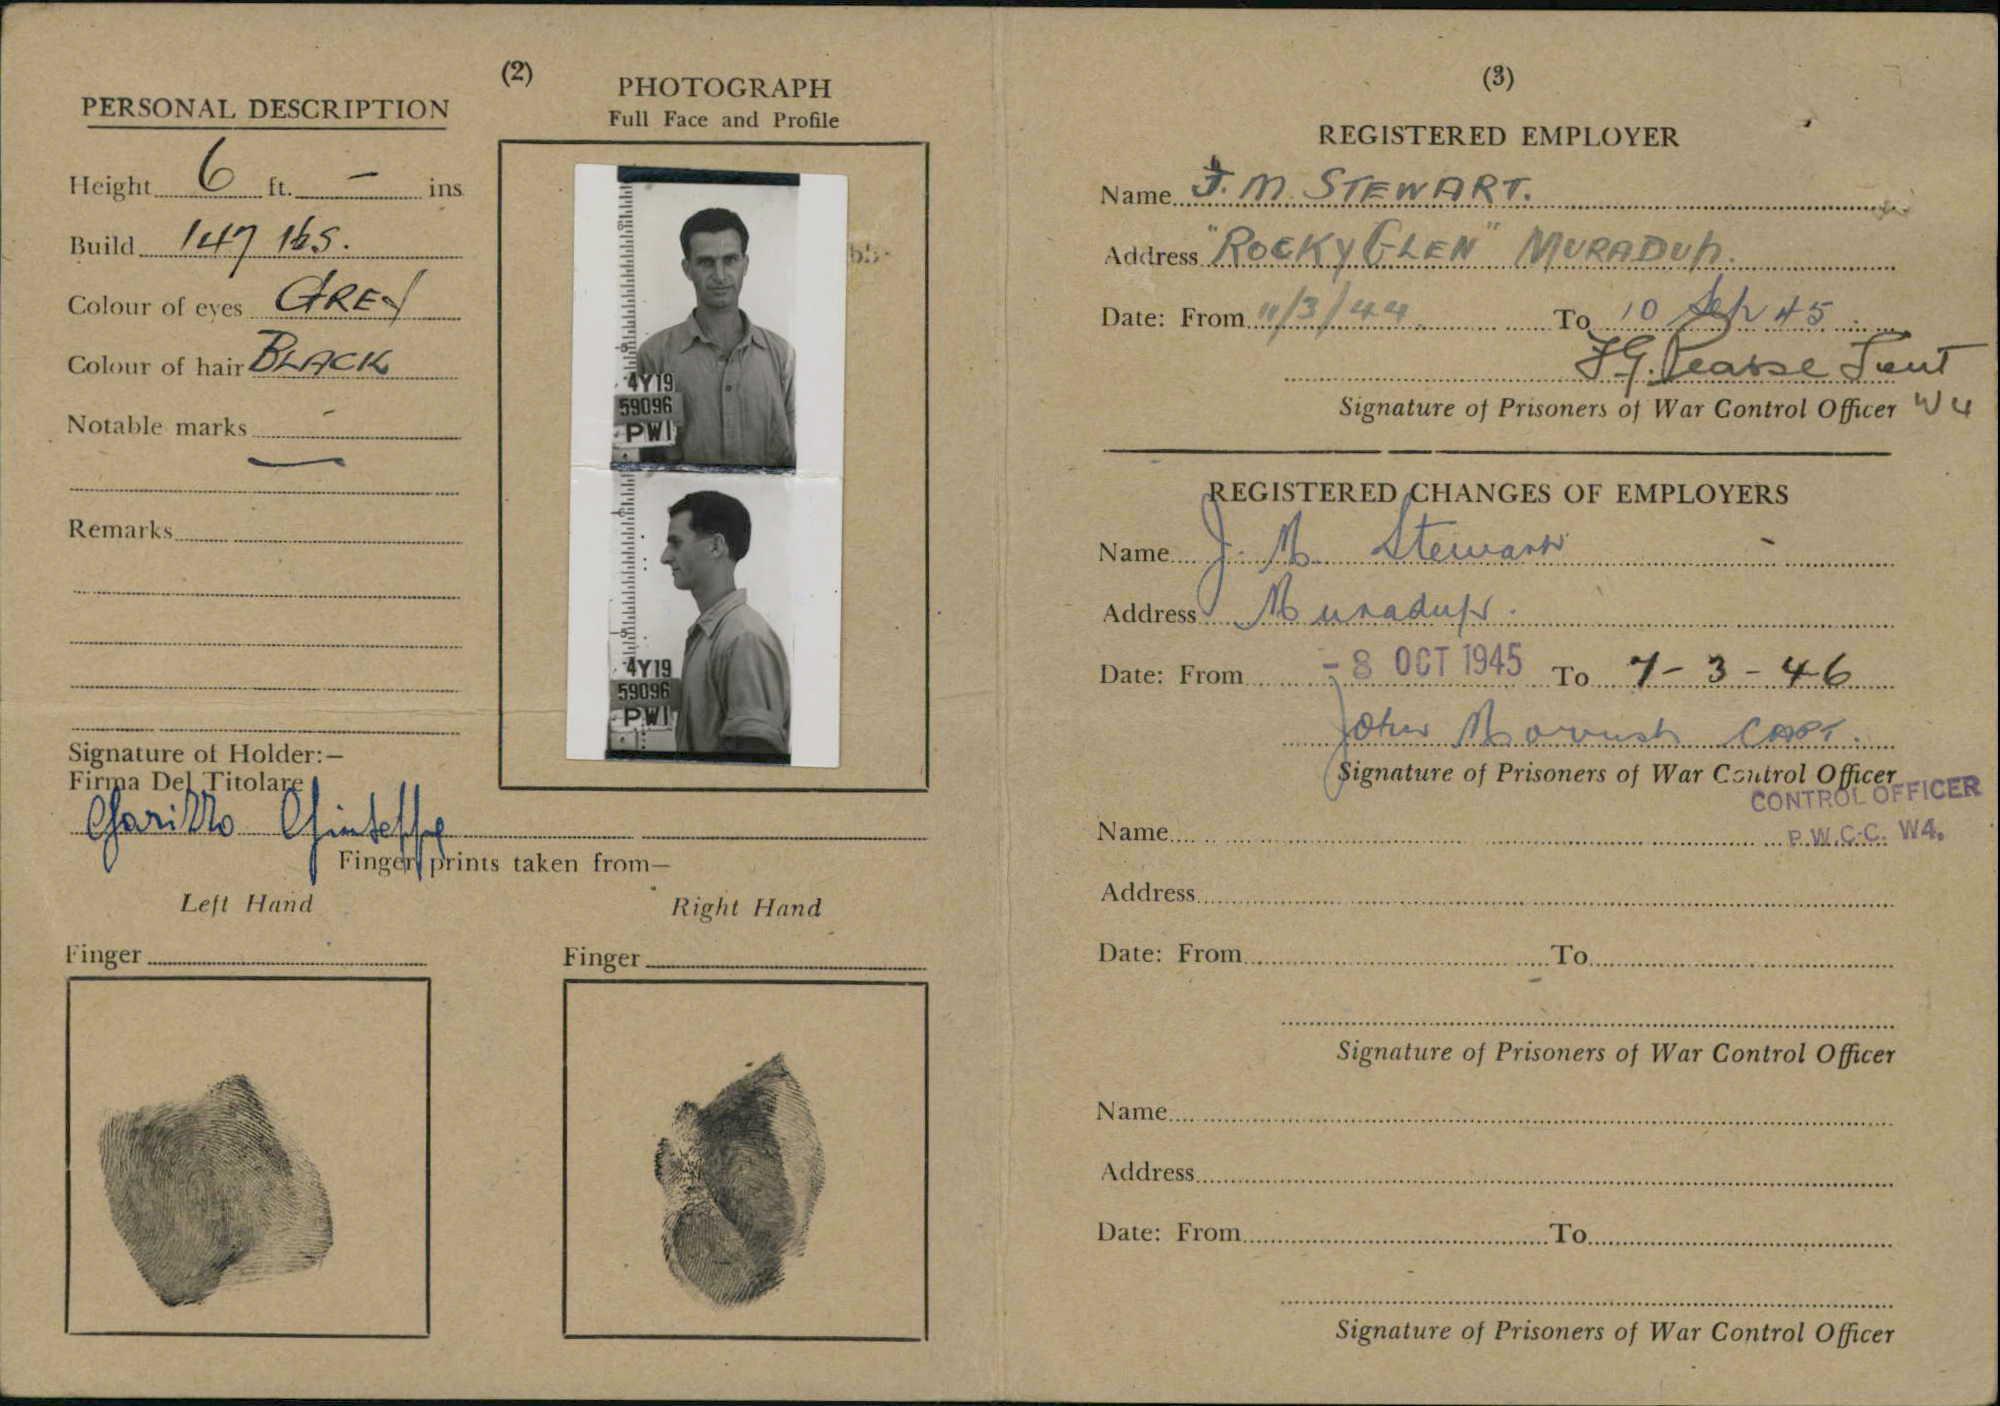 Garizzo Identity Card 1